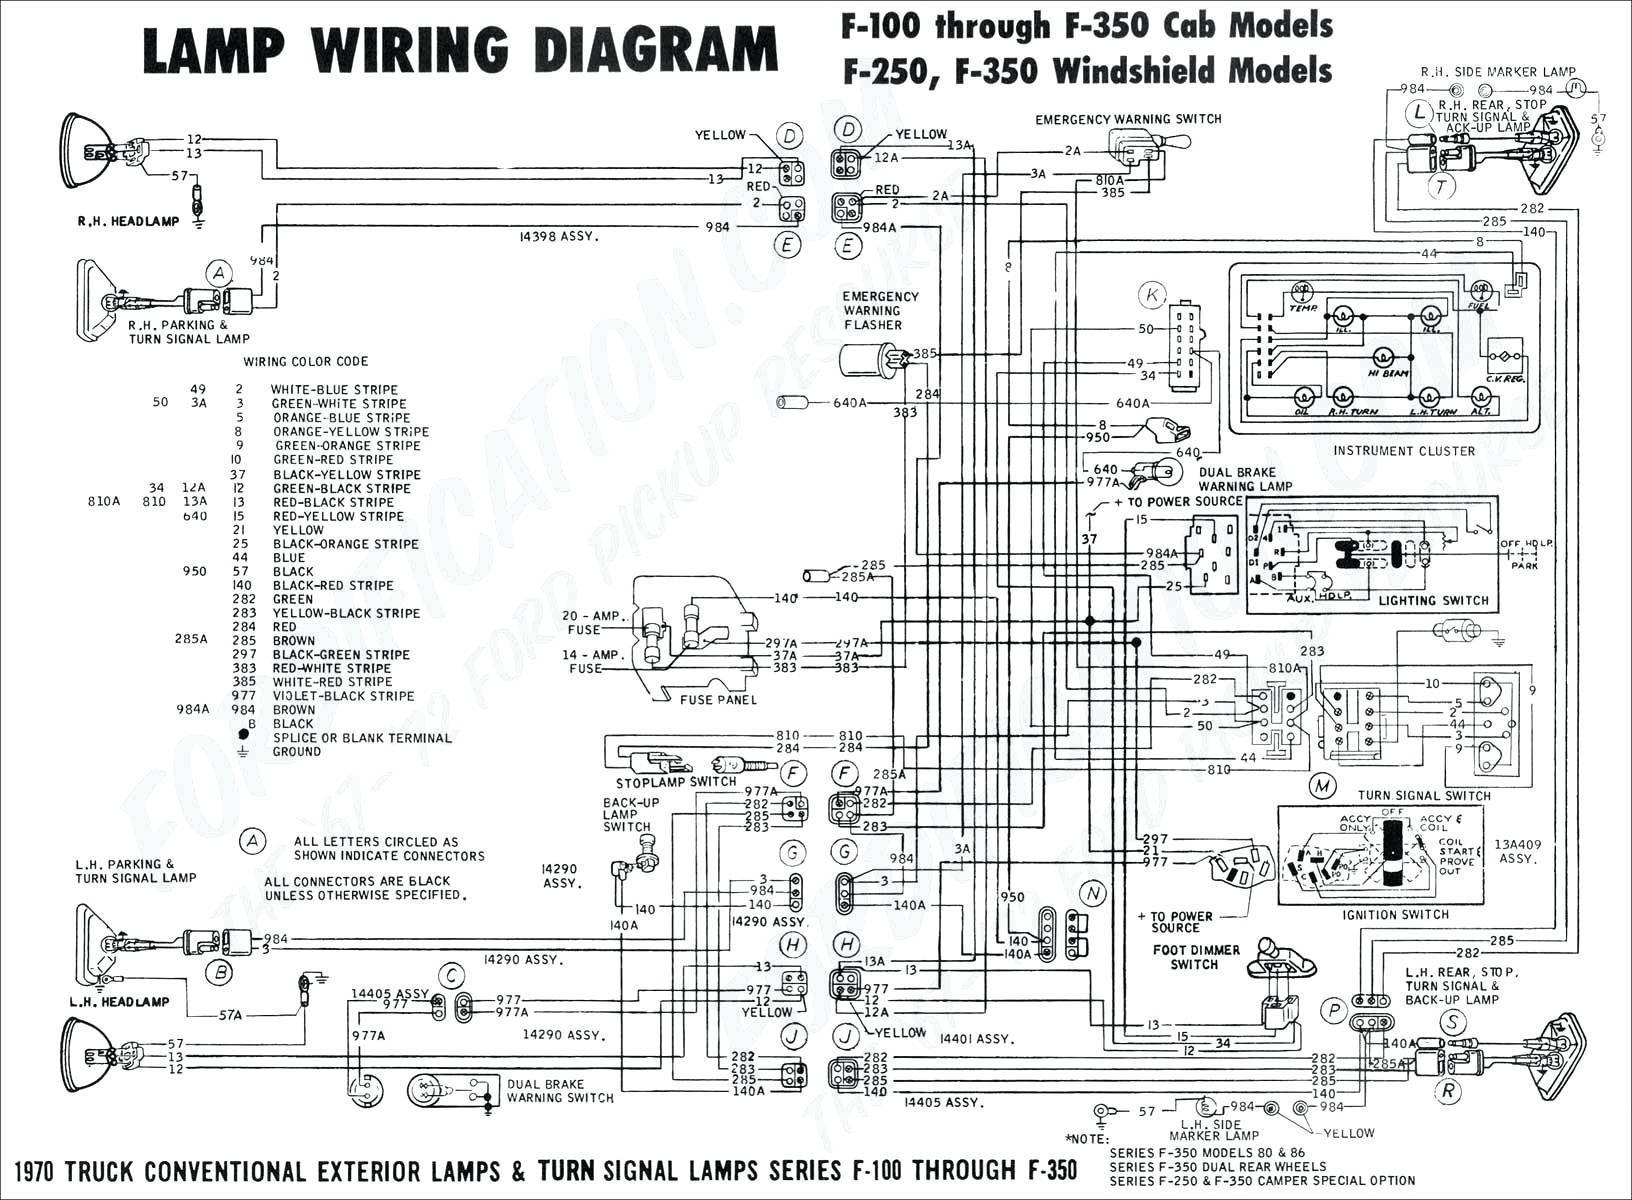 2003 silverado tail light wiring diagram wiring diagram third level